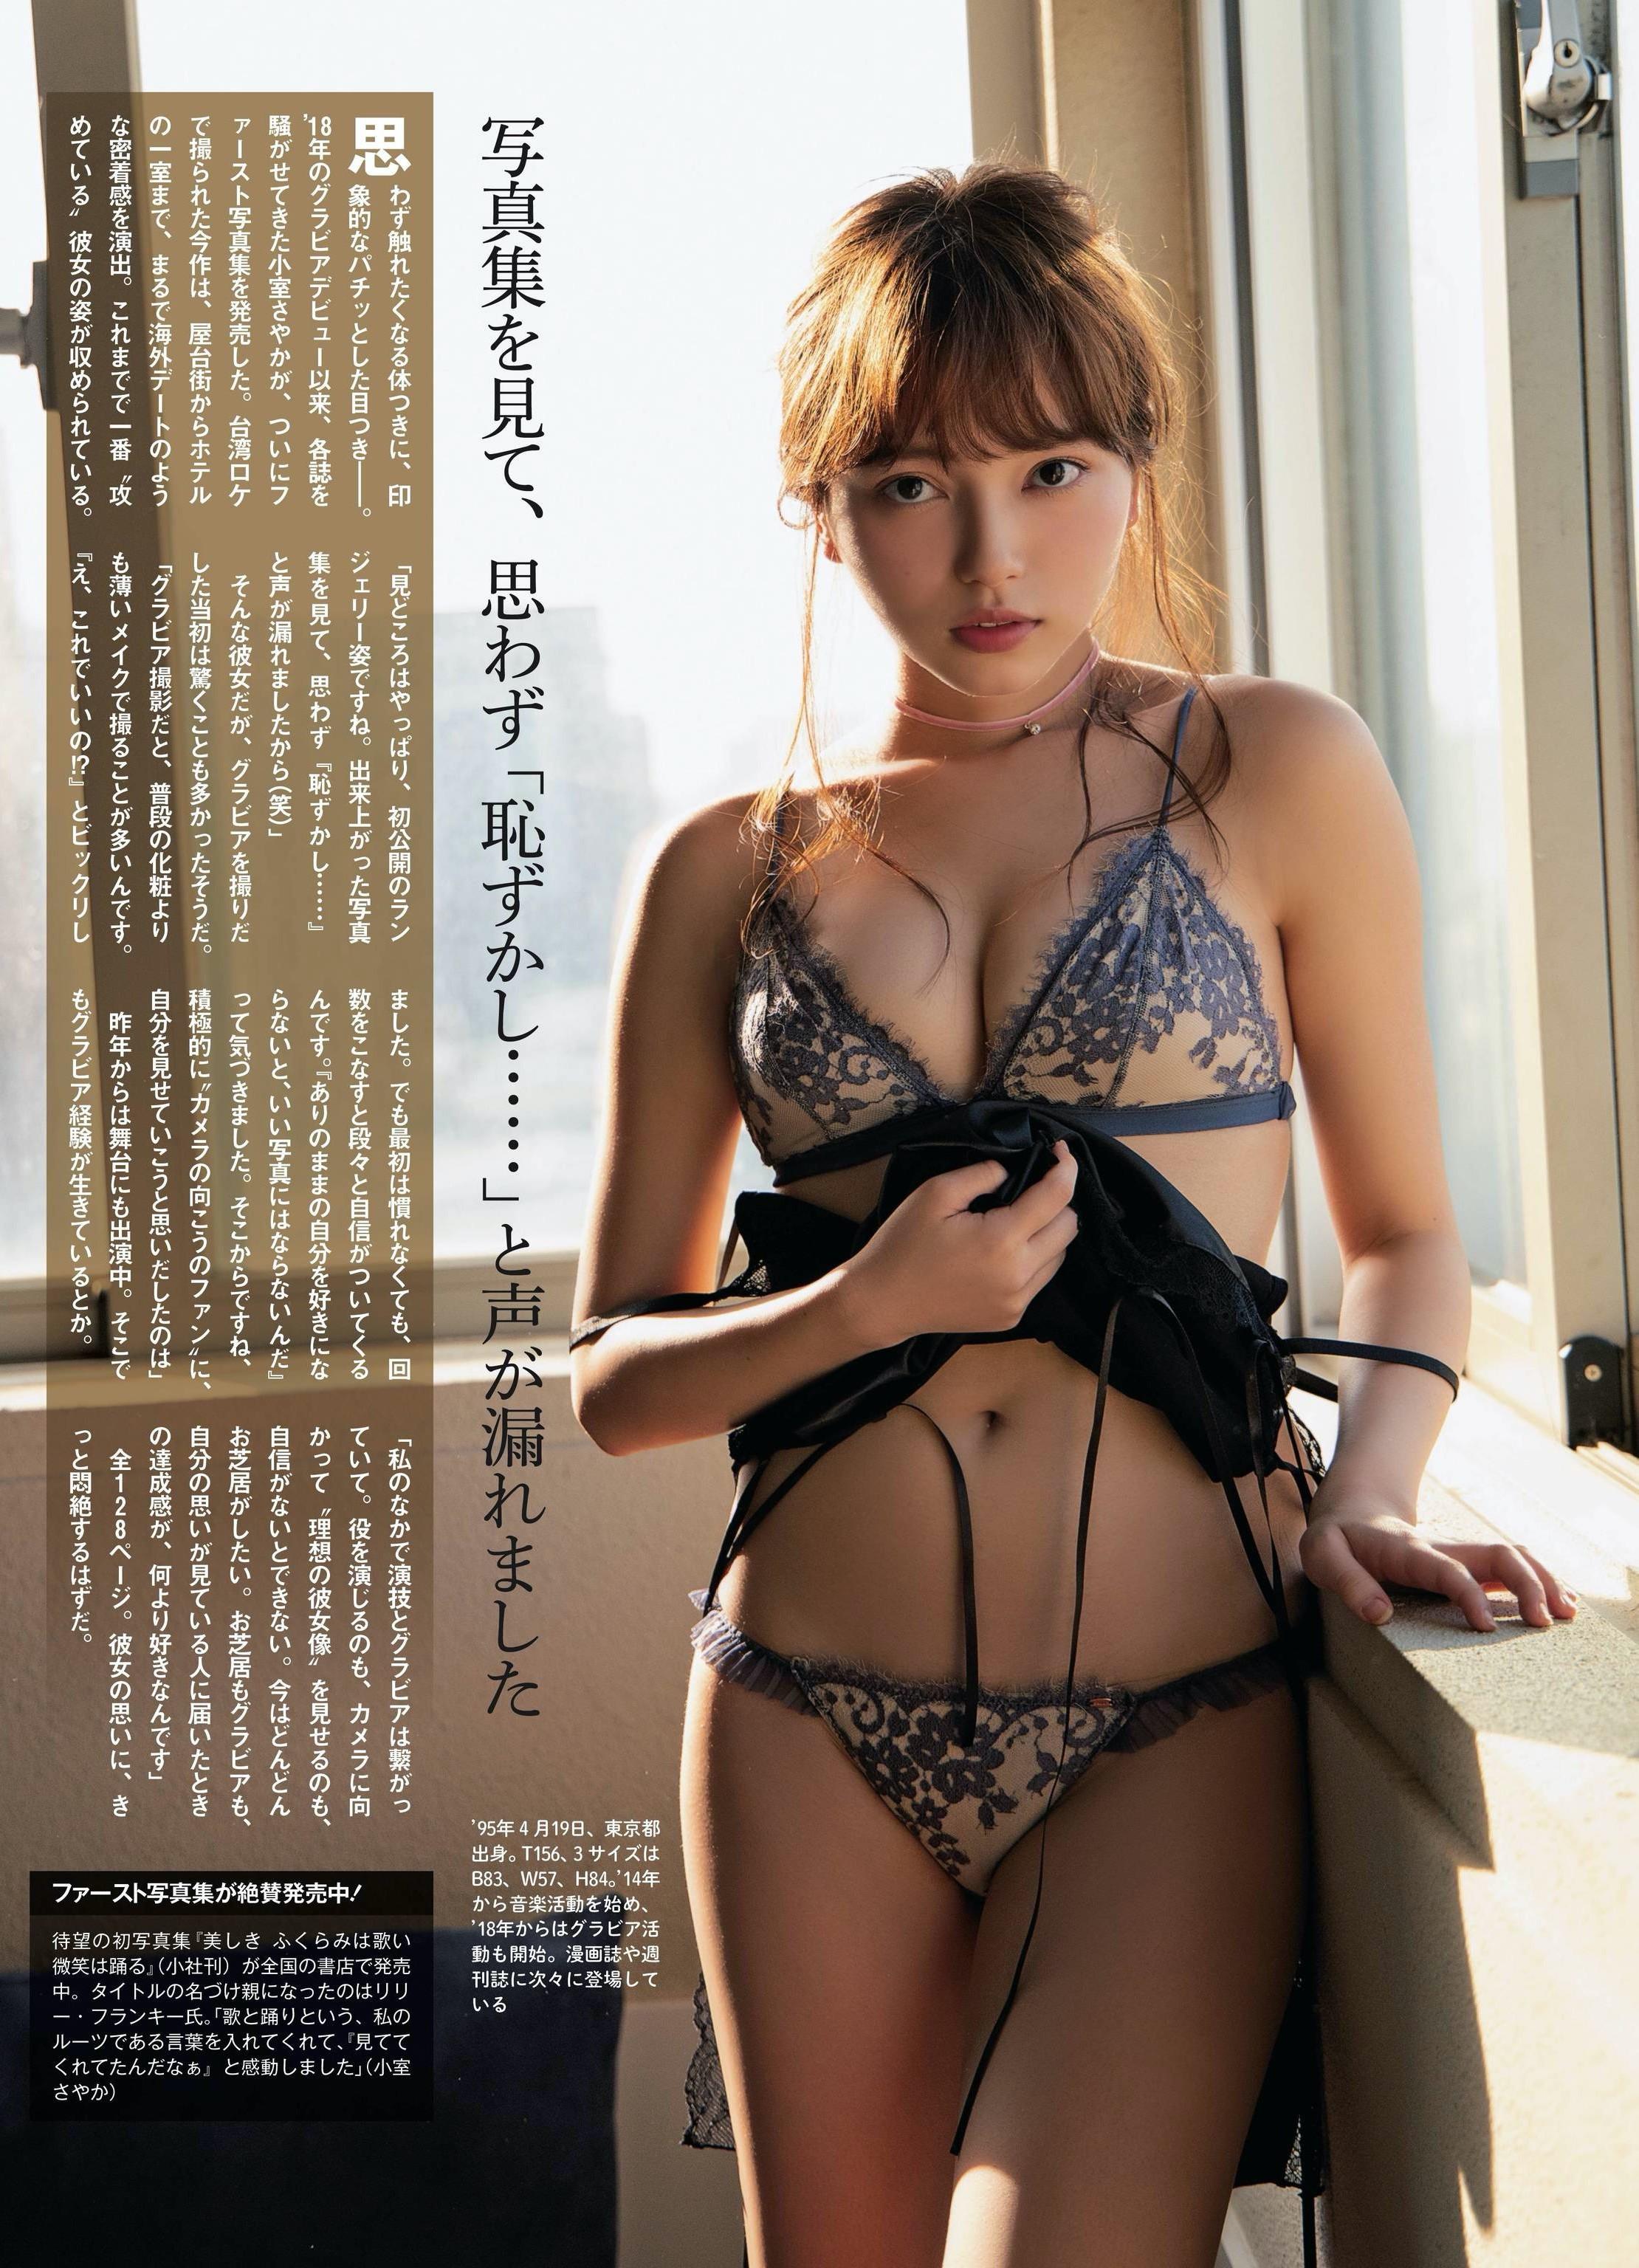 1-Sayaka-Komuro-4